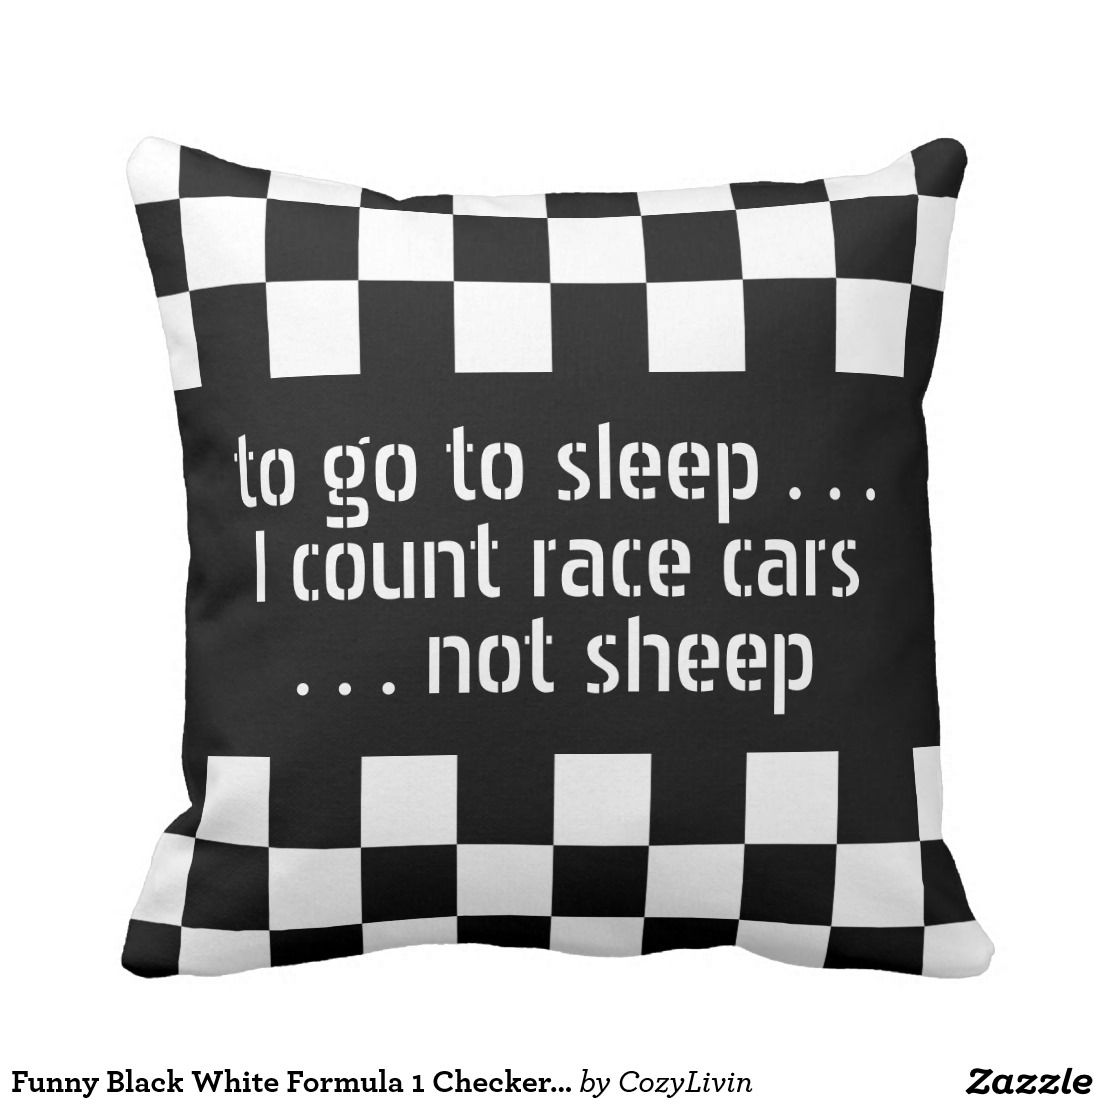 cool black white formula 1 checkered flags pattern throw pillow